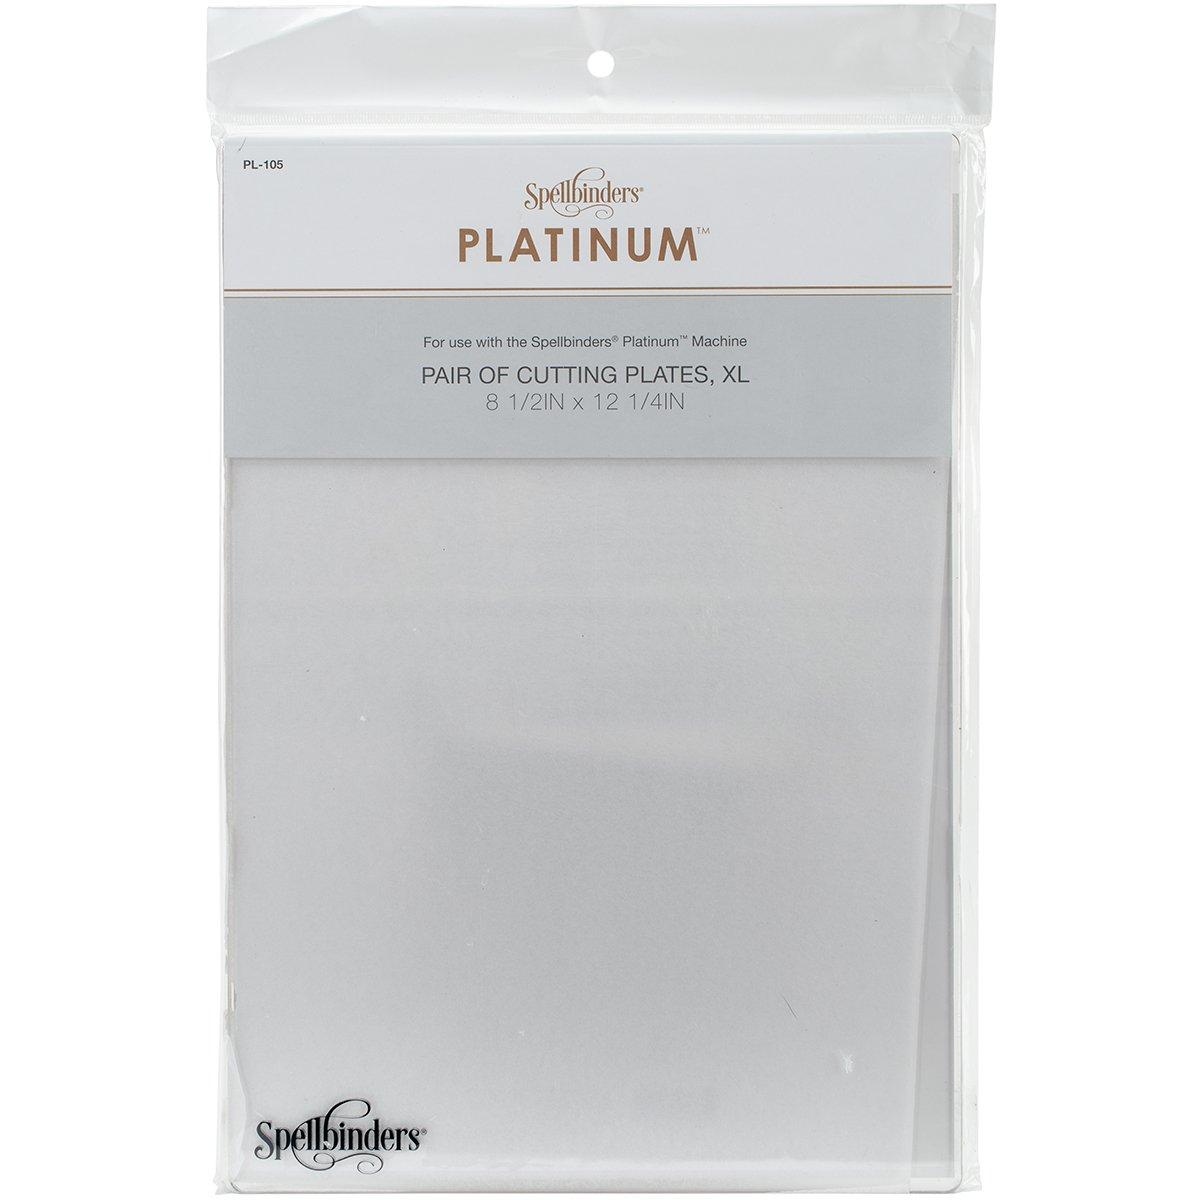 Materiales sint/éticos 0.63 x 22.86 x 34.92 cm Spellbinders Platinum Platos de Corte